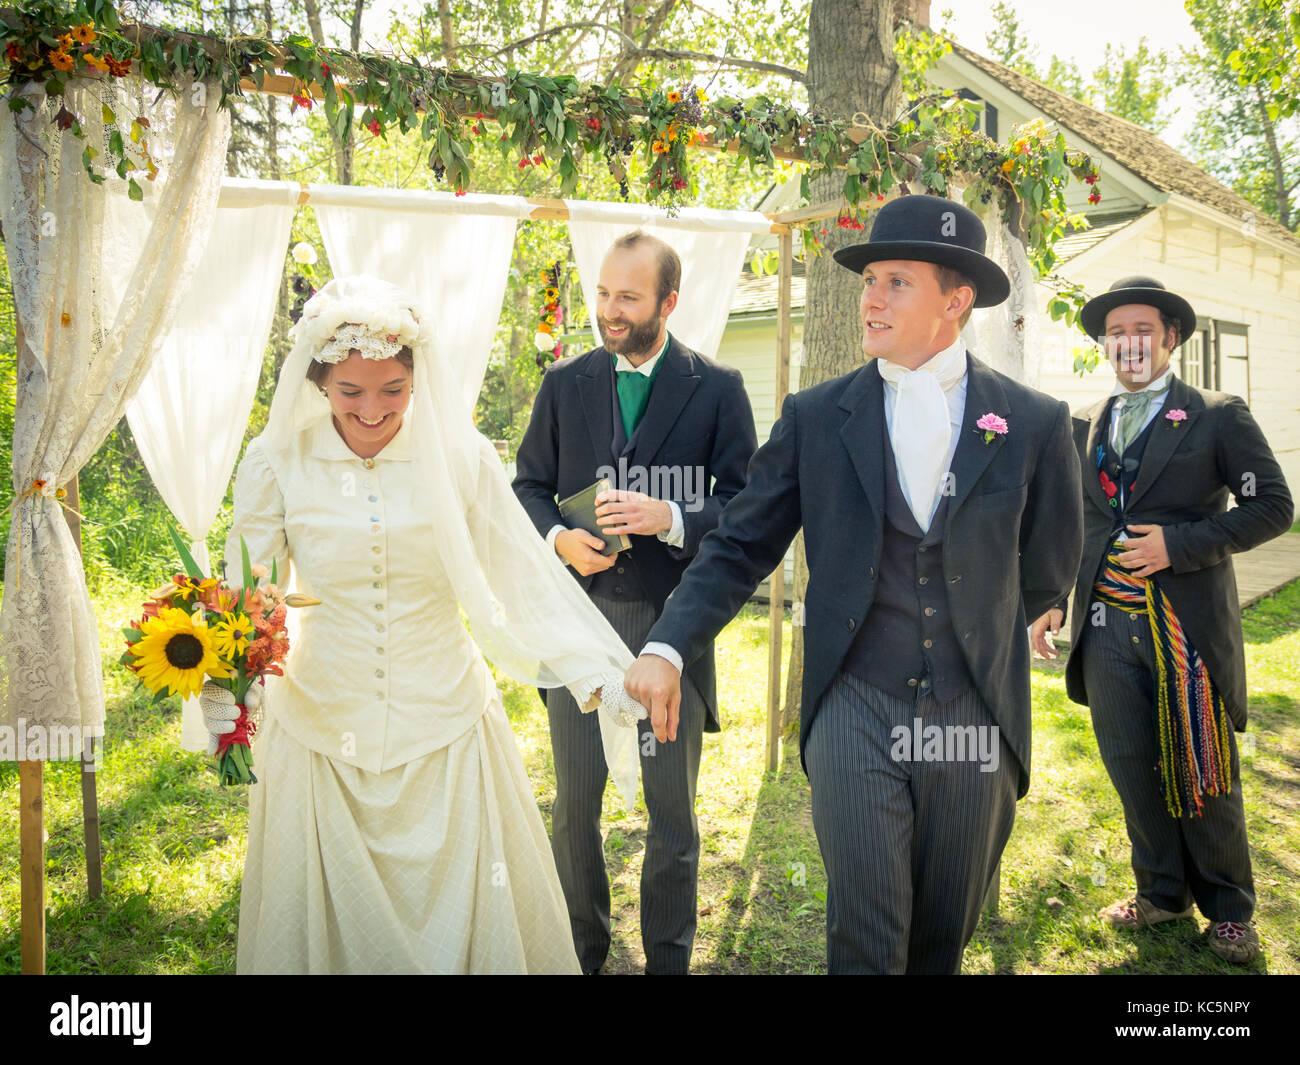 Wedding Ceremony Traditional.Period Actors Re Enact A Traditional 19th Century Metis Wedding